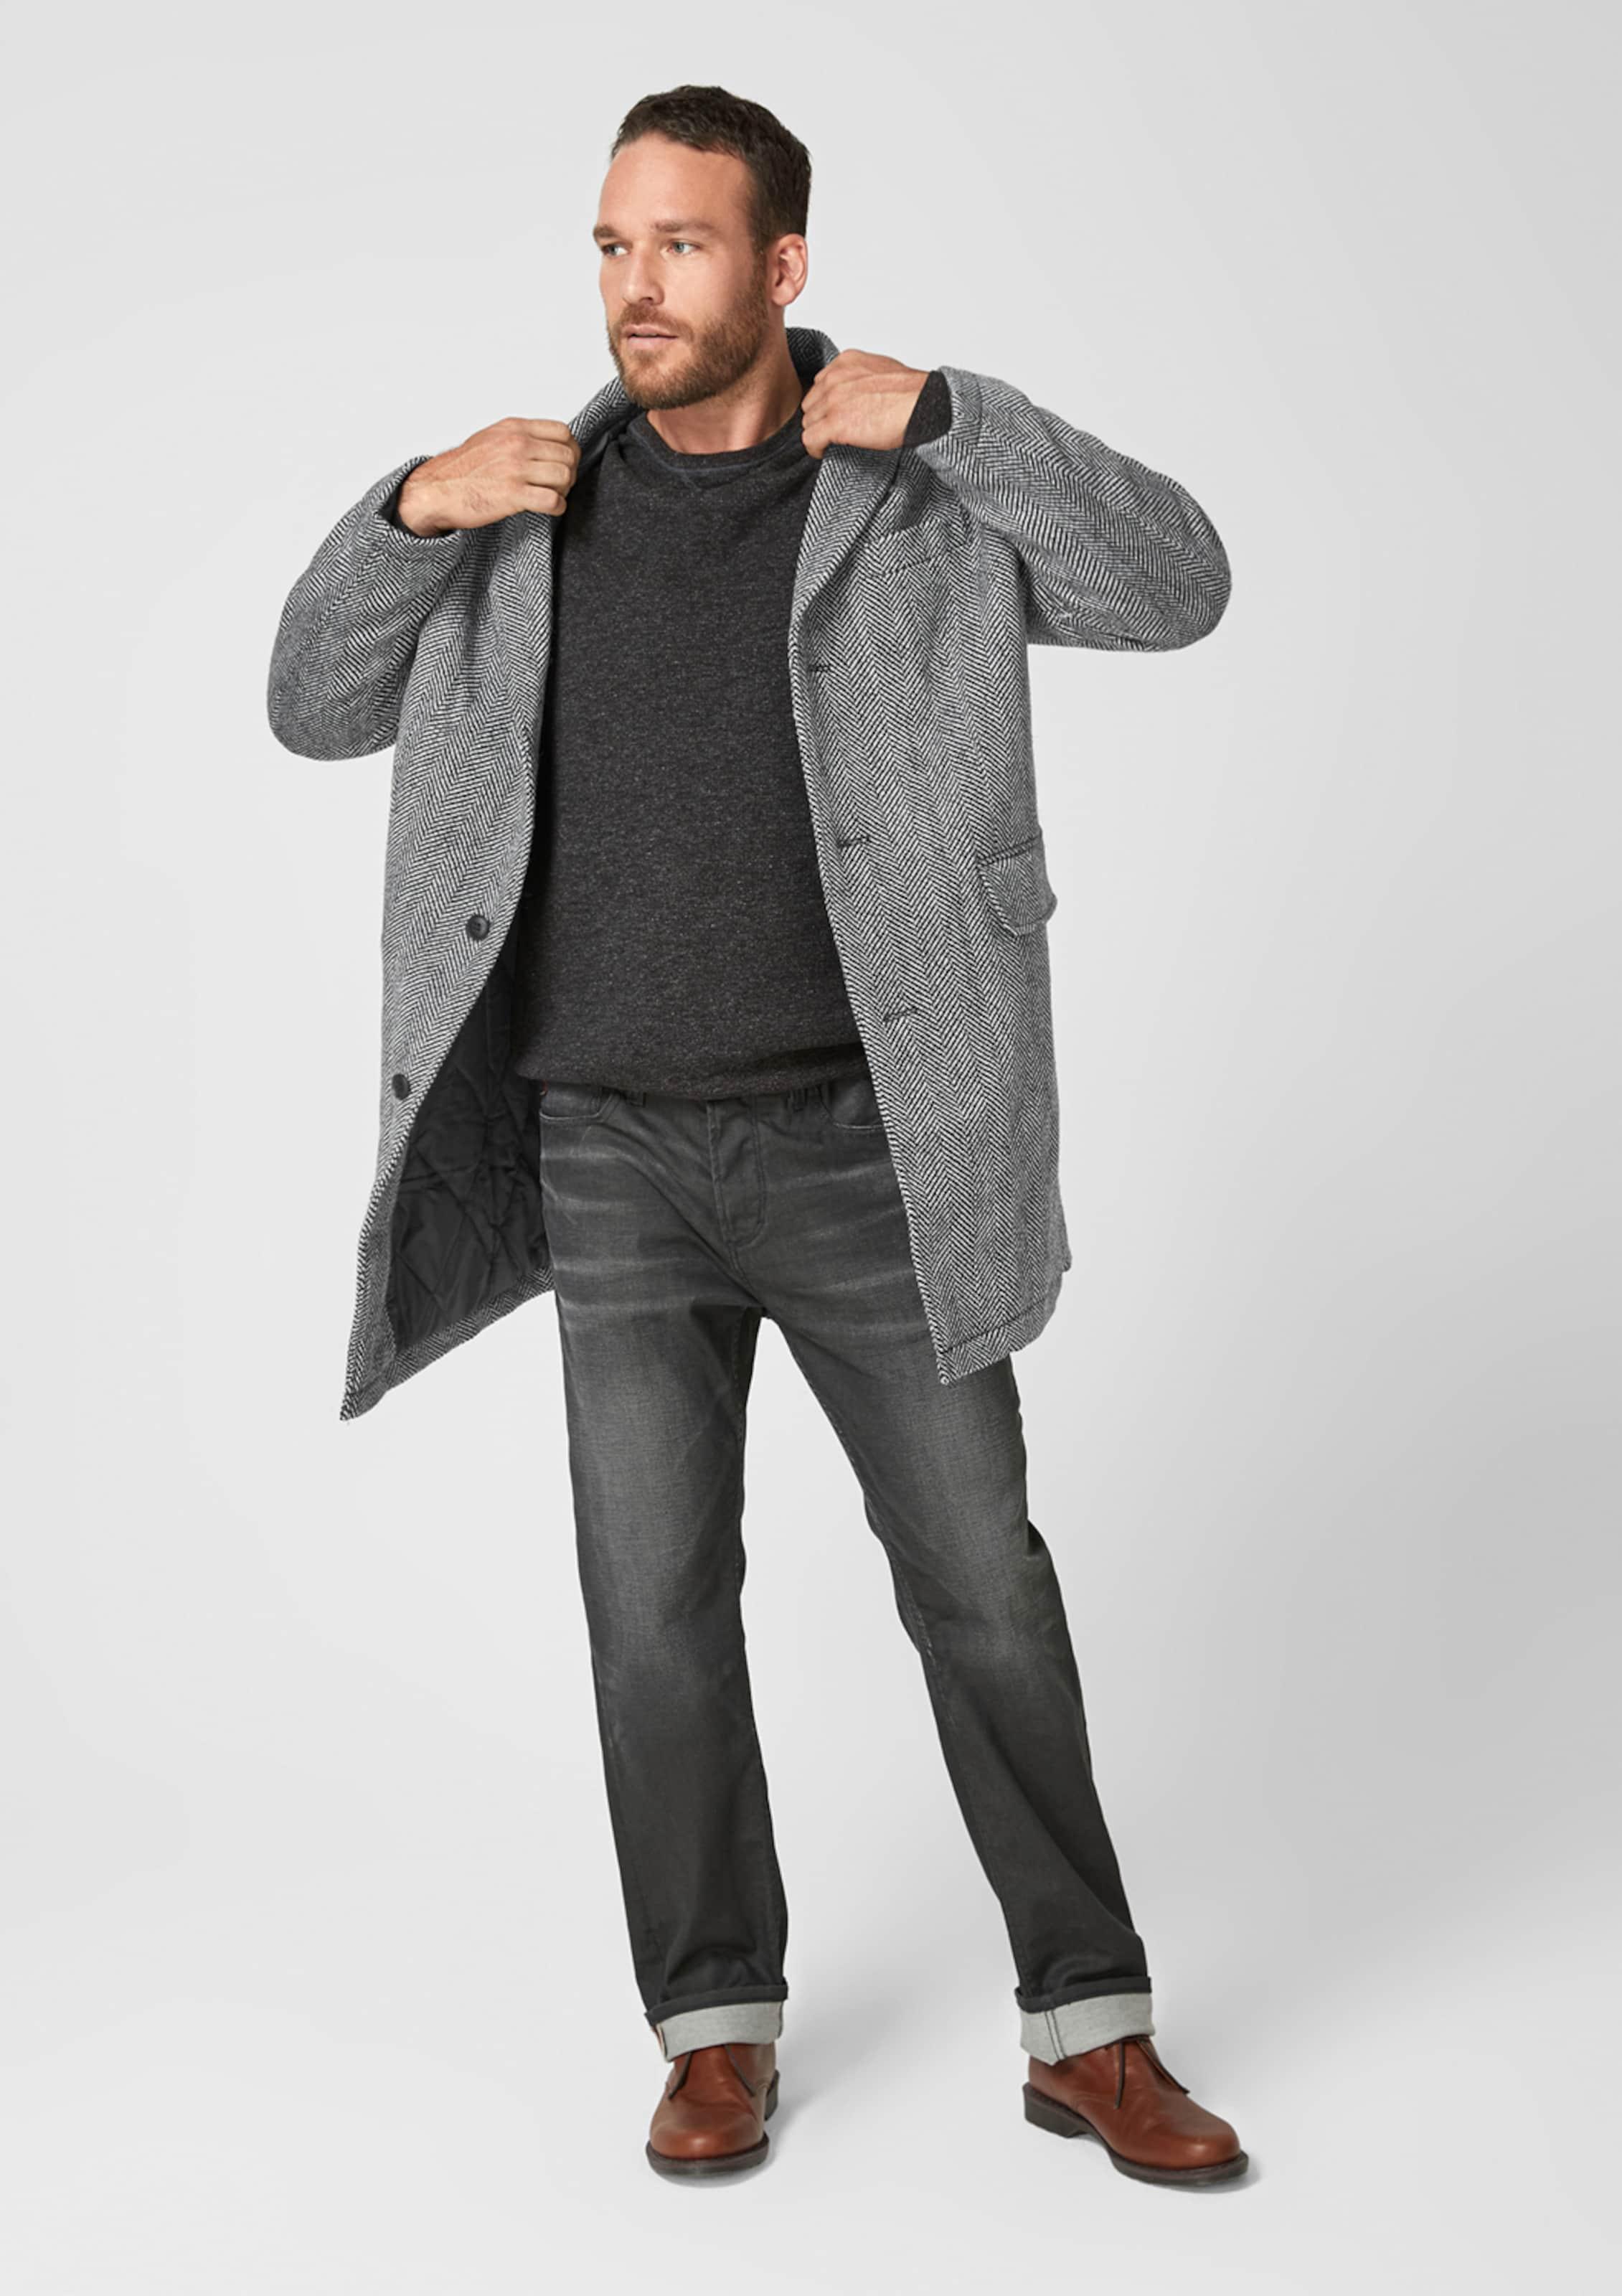 Label oliver SchwarzWeiß Mantel S Red In tsCxBoQhrd